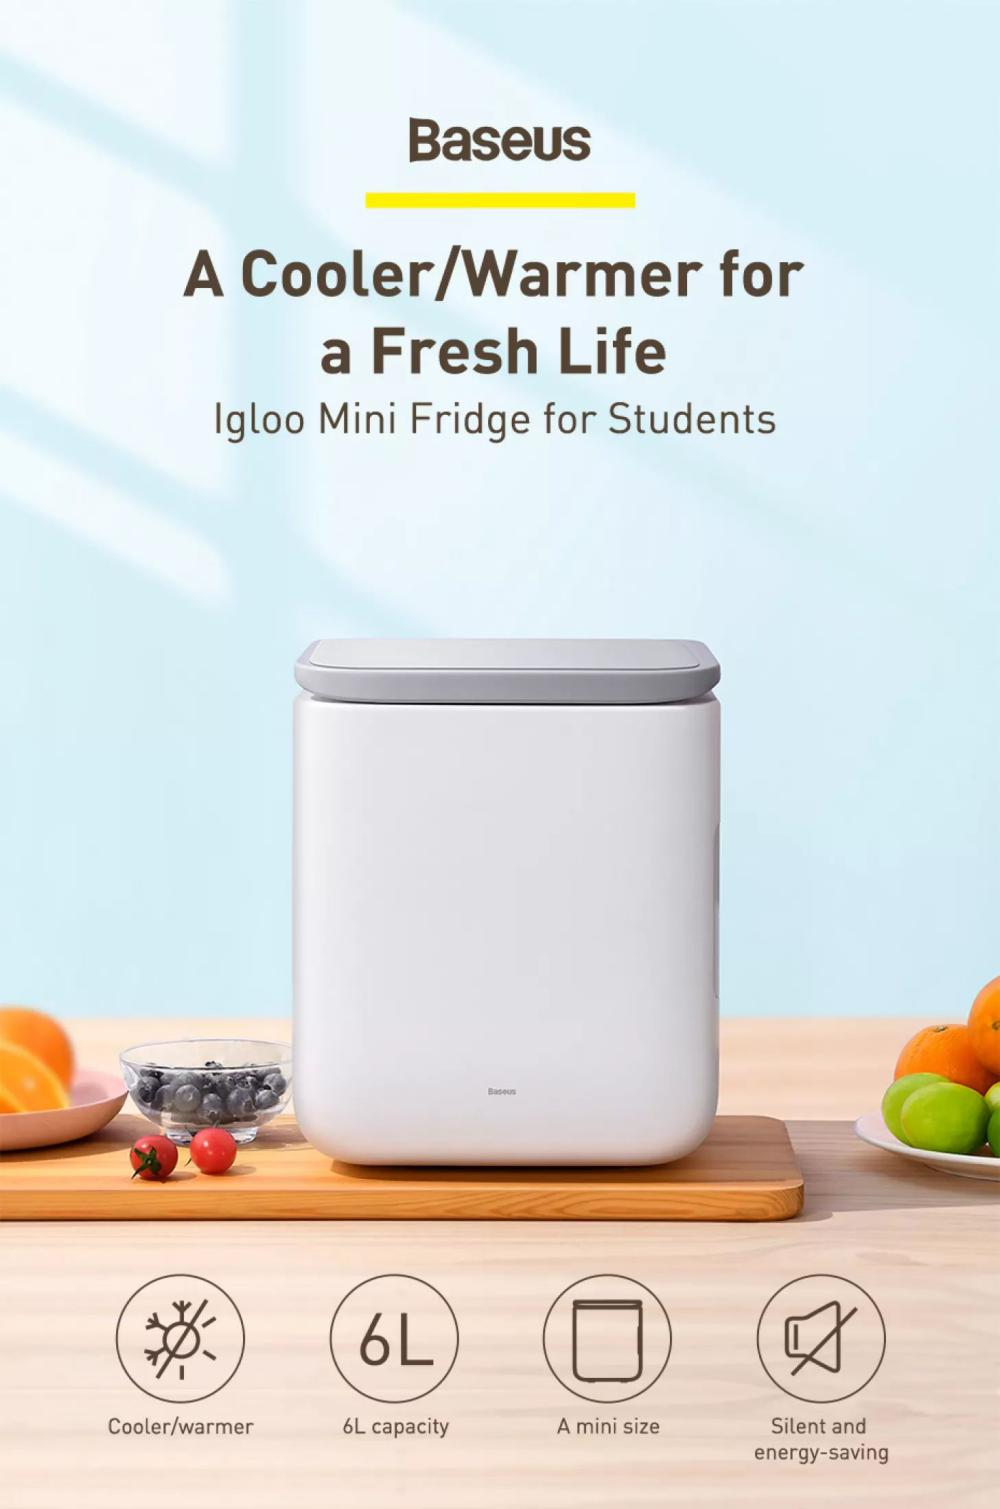 Baseus Igloo Mini Fridge For Students 6l Cooler And Warmer (2)